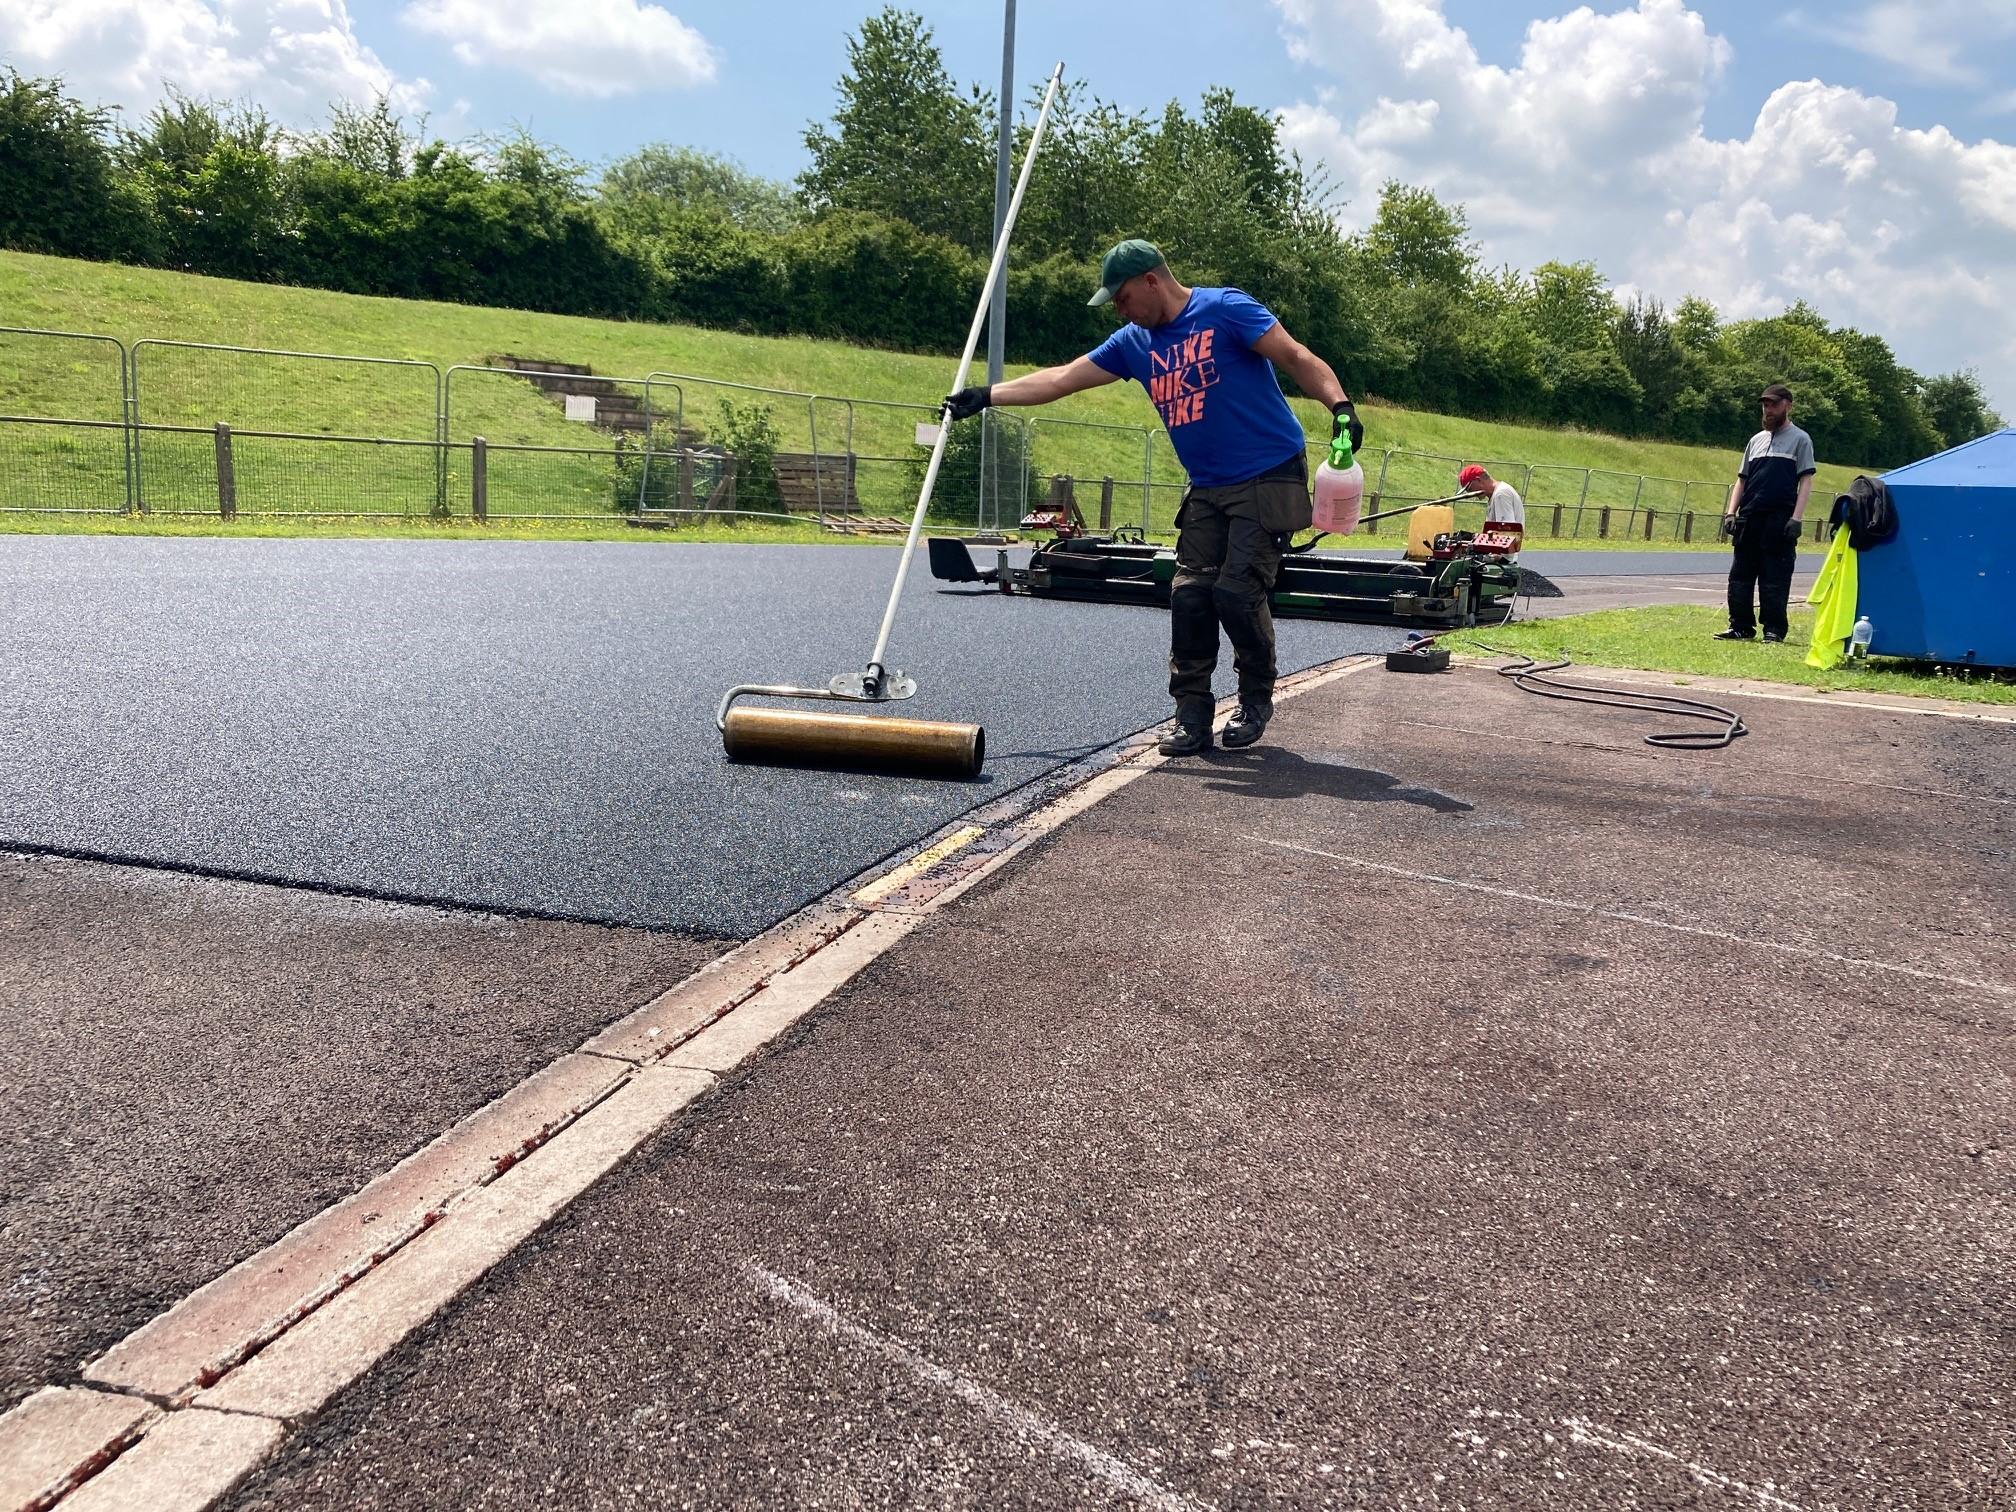 Athletics track resurfacing